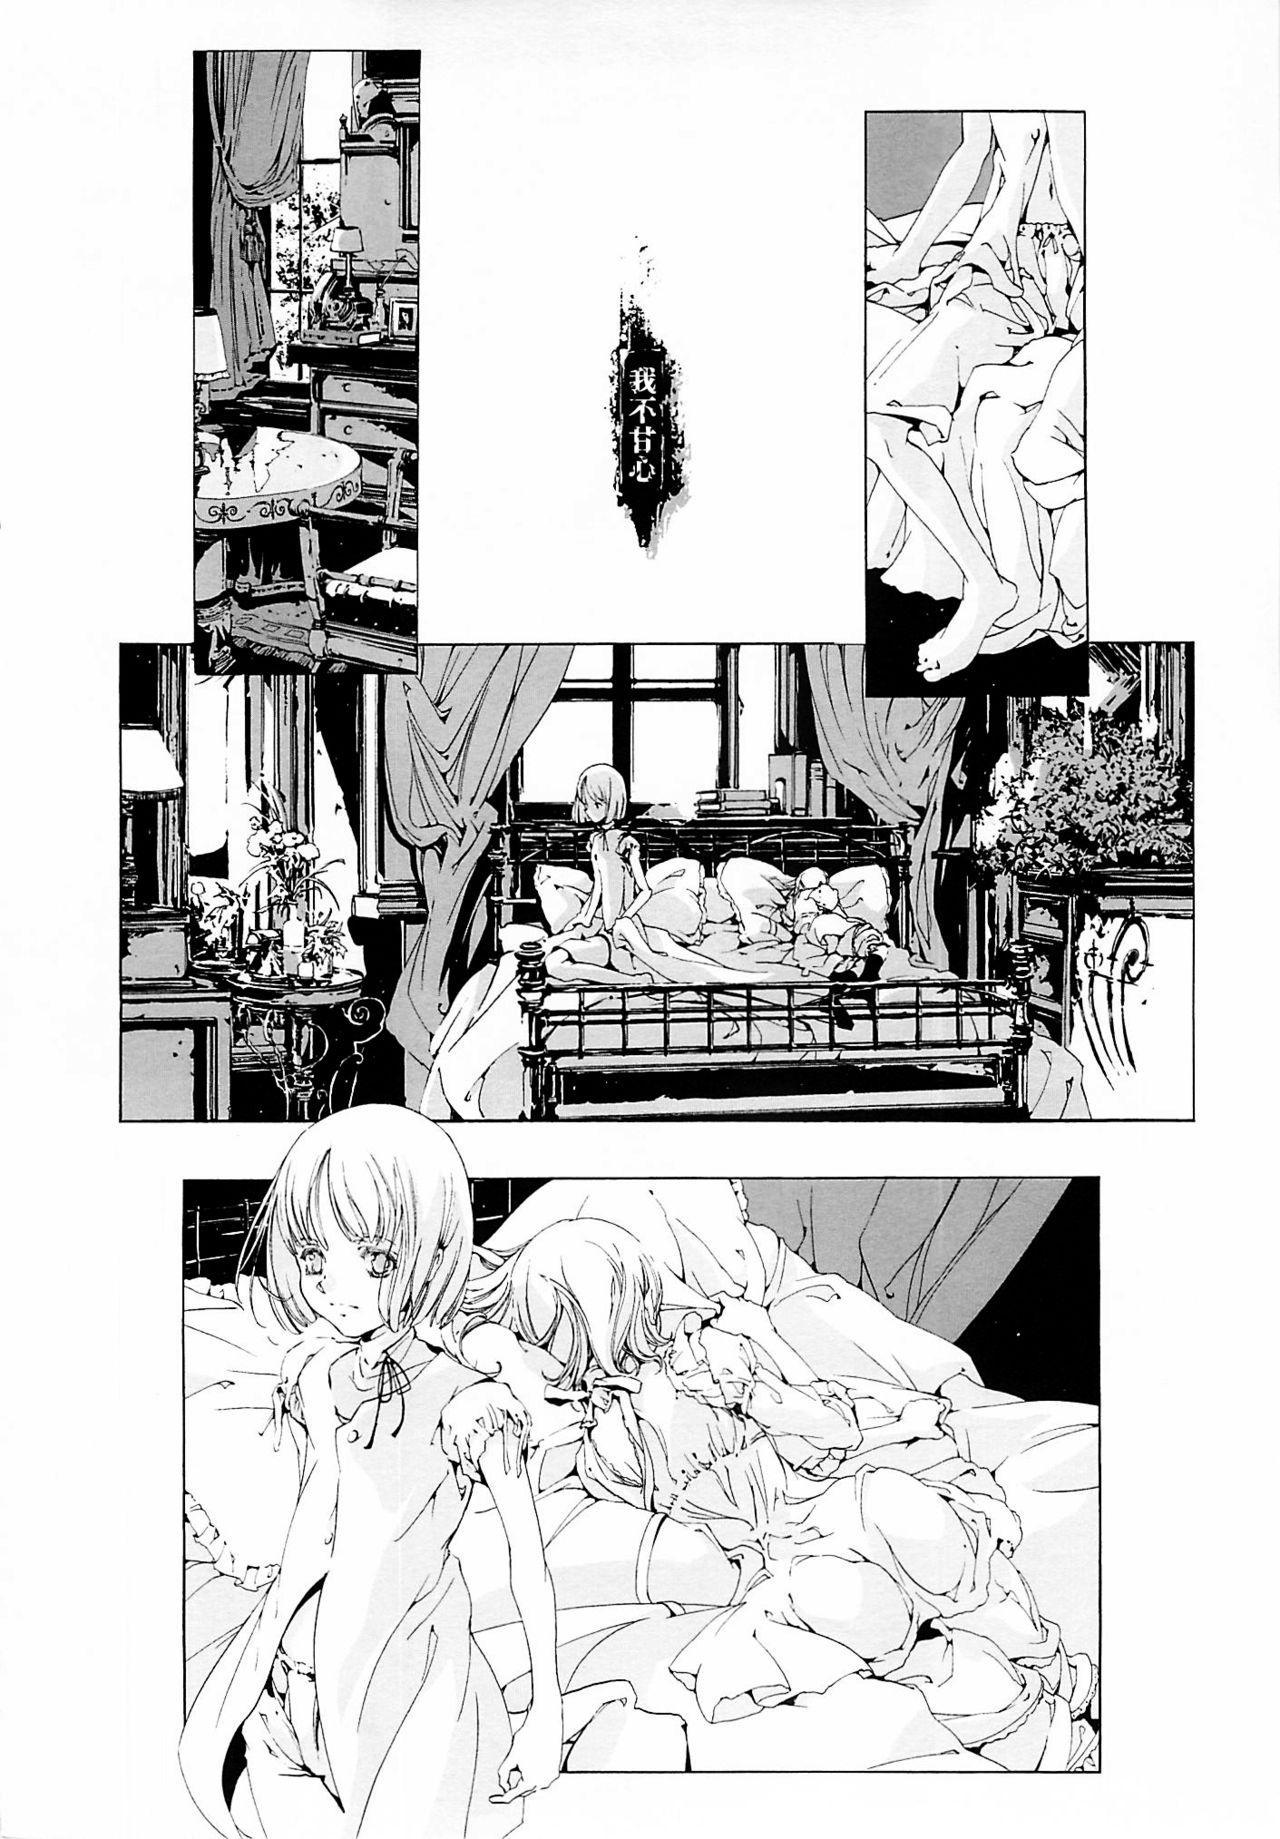 (CR37) [70 Nenshiki Yuukyuu Kikan (Endou Okito)] ORGAN-Tino  01-02[Chinese] [拾荒者汉化组] [Incomplete] 89